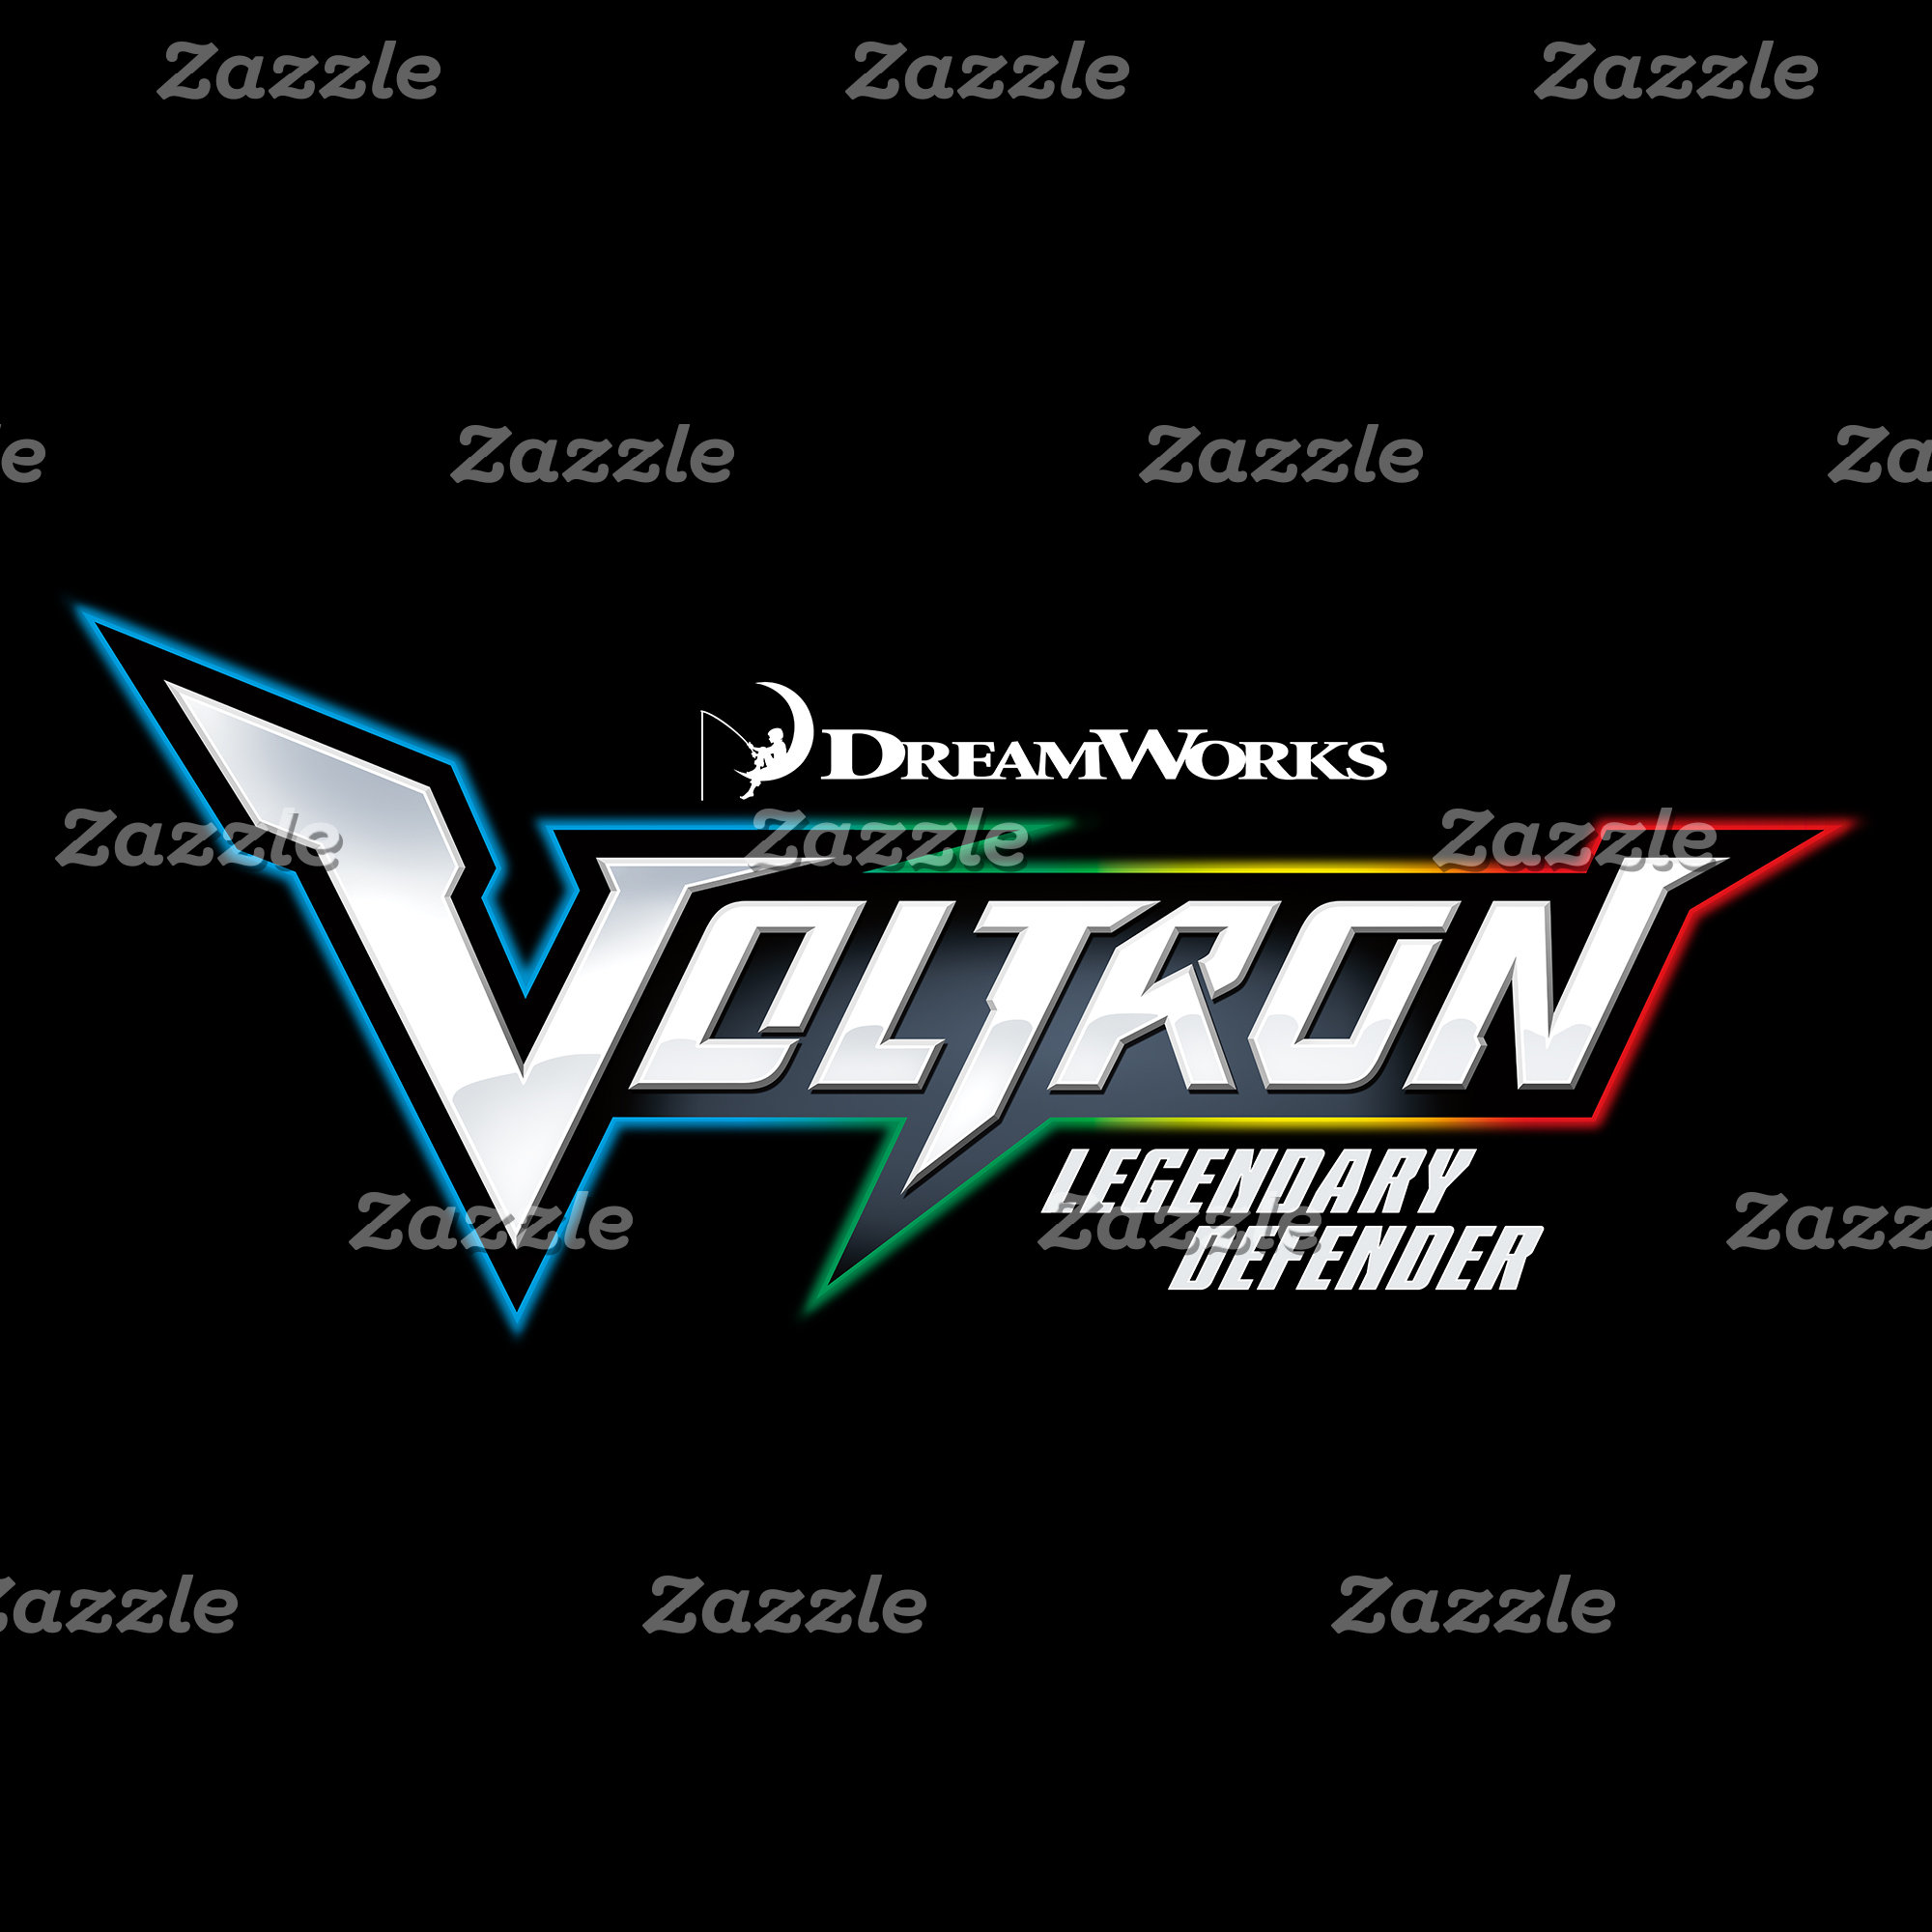 Voltron | Legendary Defender Logo